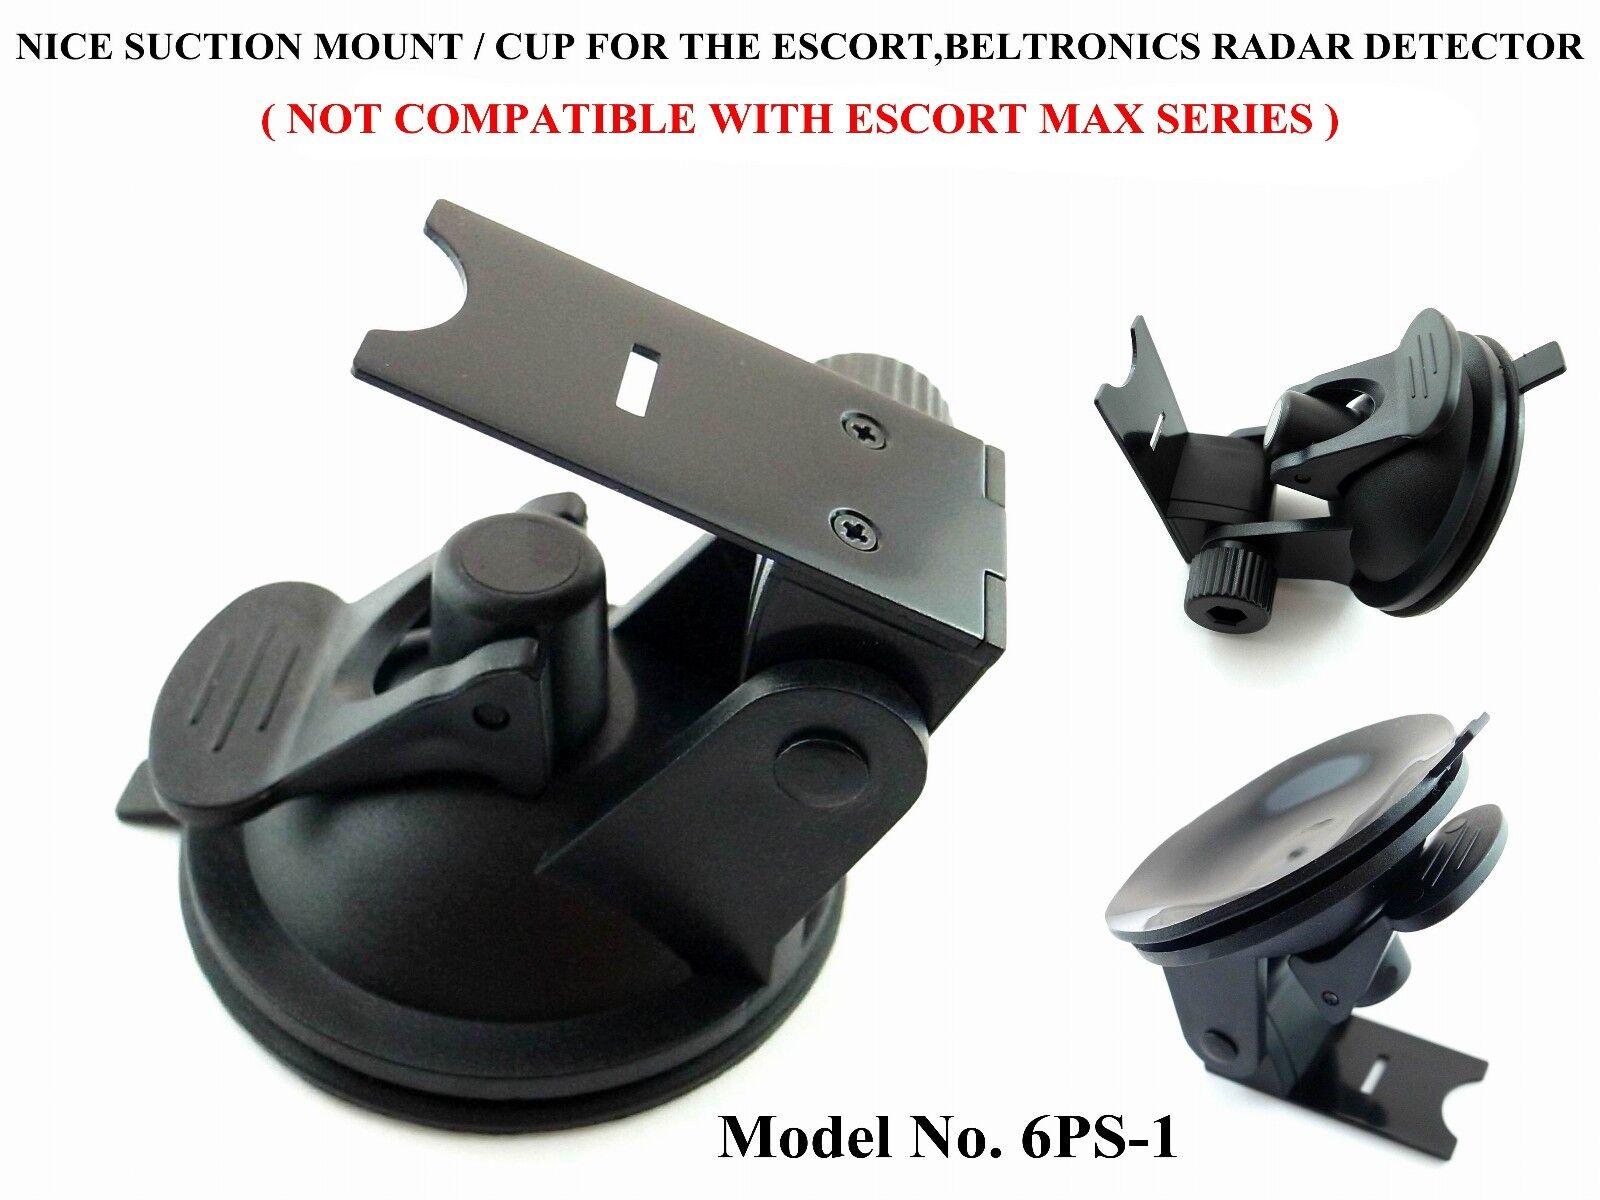 Nice Suction Cup / Mount For The Beltronics & Escort 9500 S4 X80 Radar Detectors